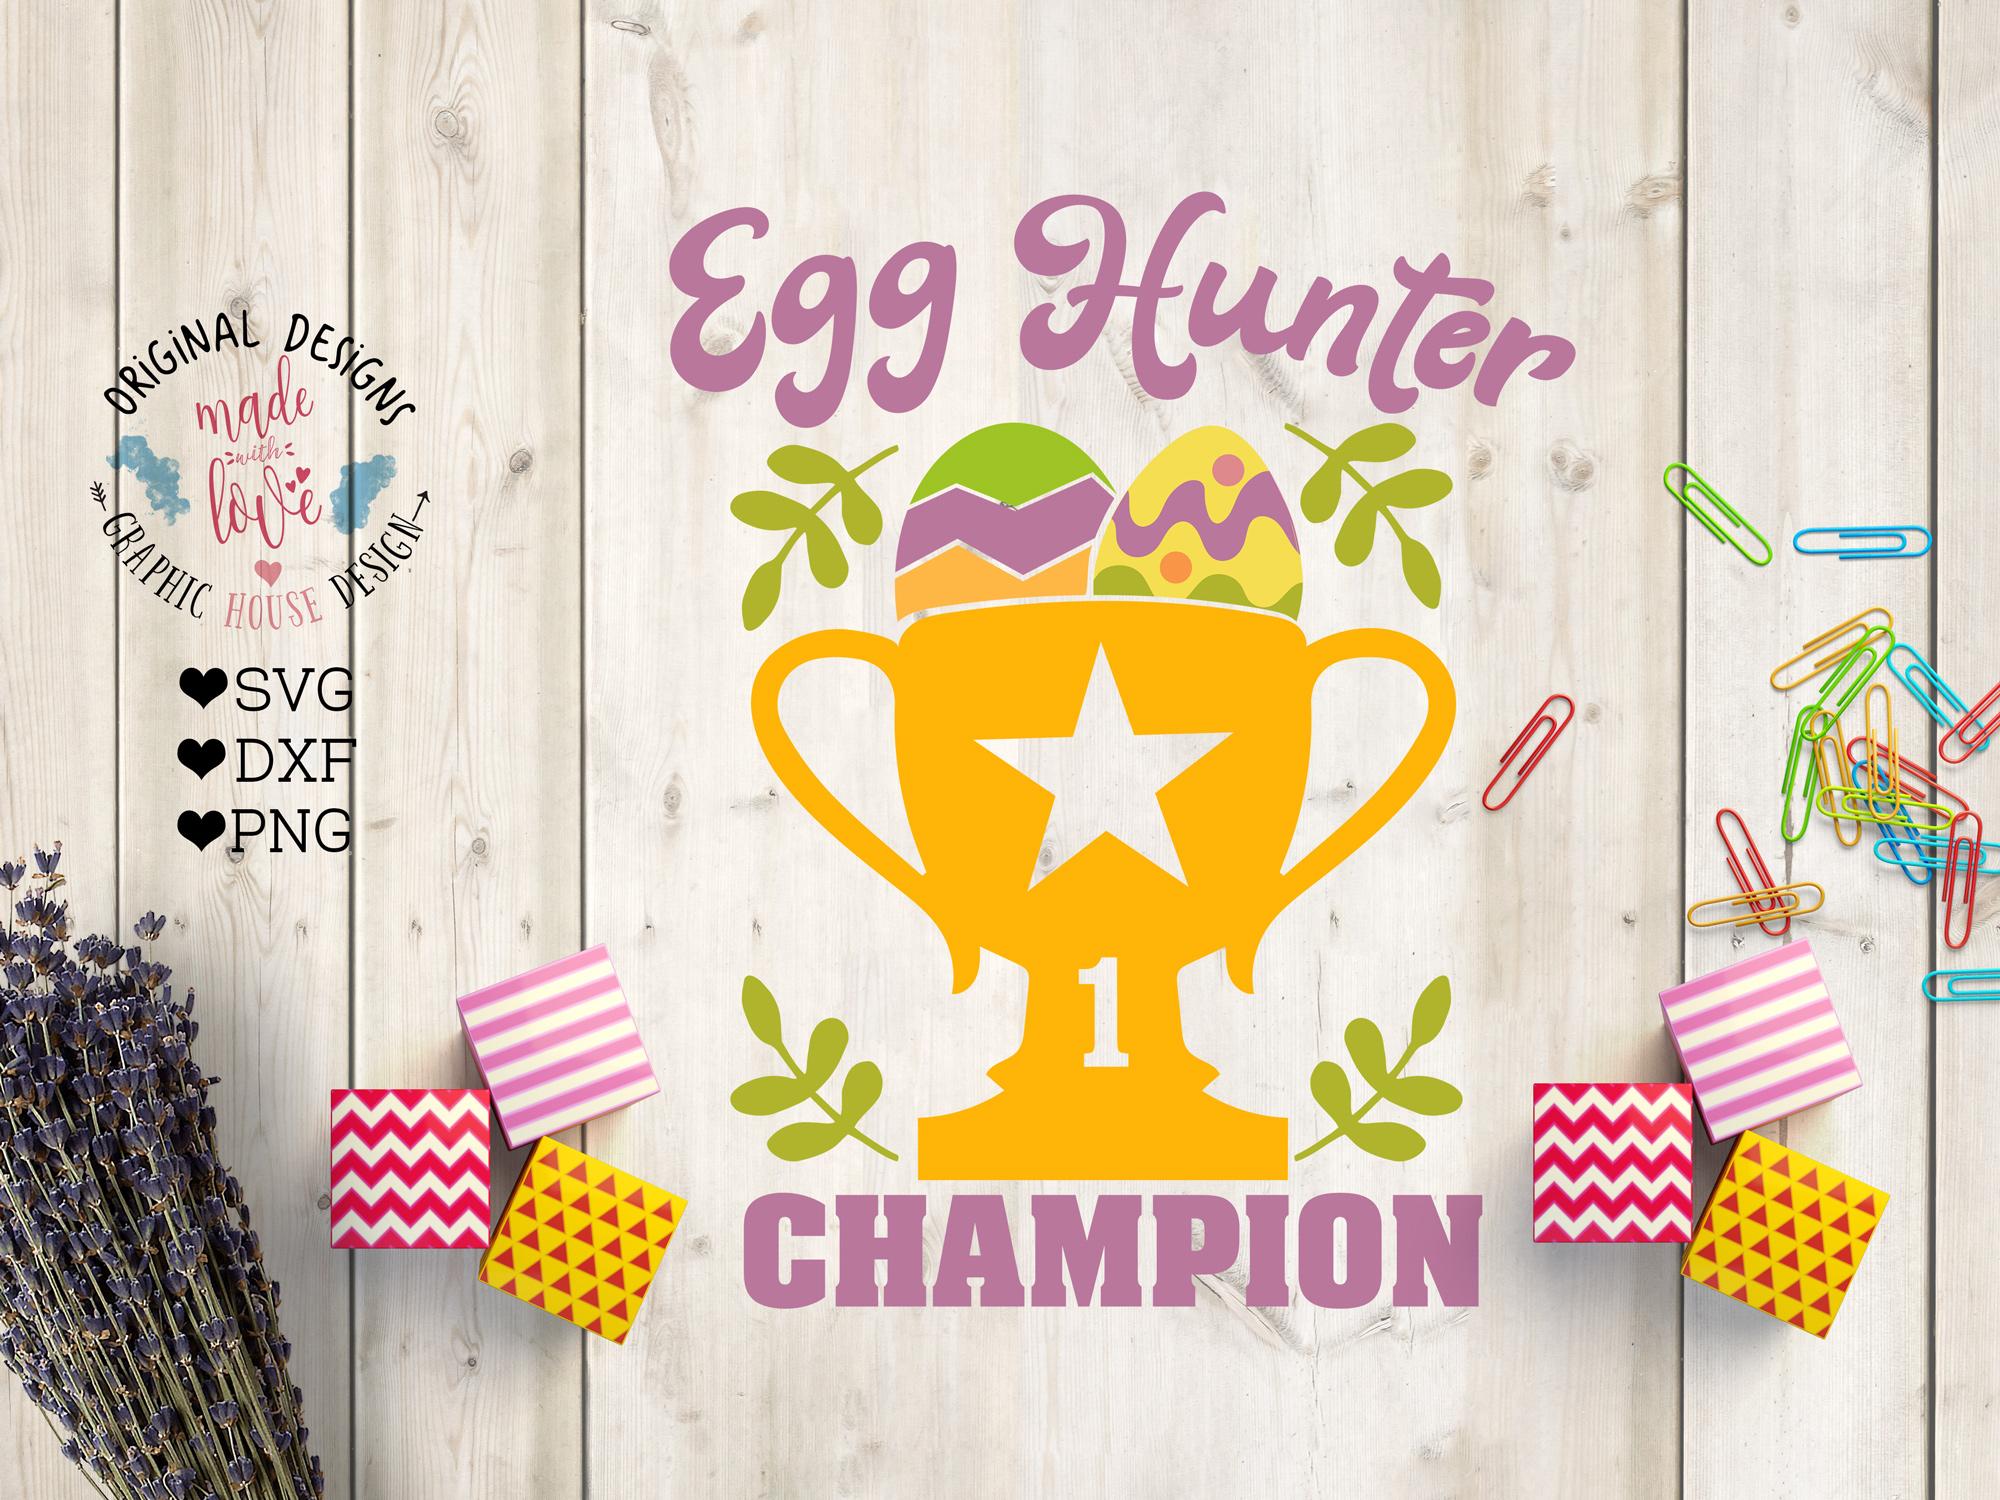 Egg Hunter Champion Cut File and Printable example image 1